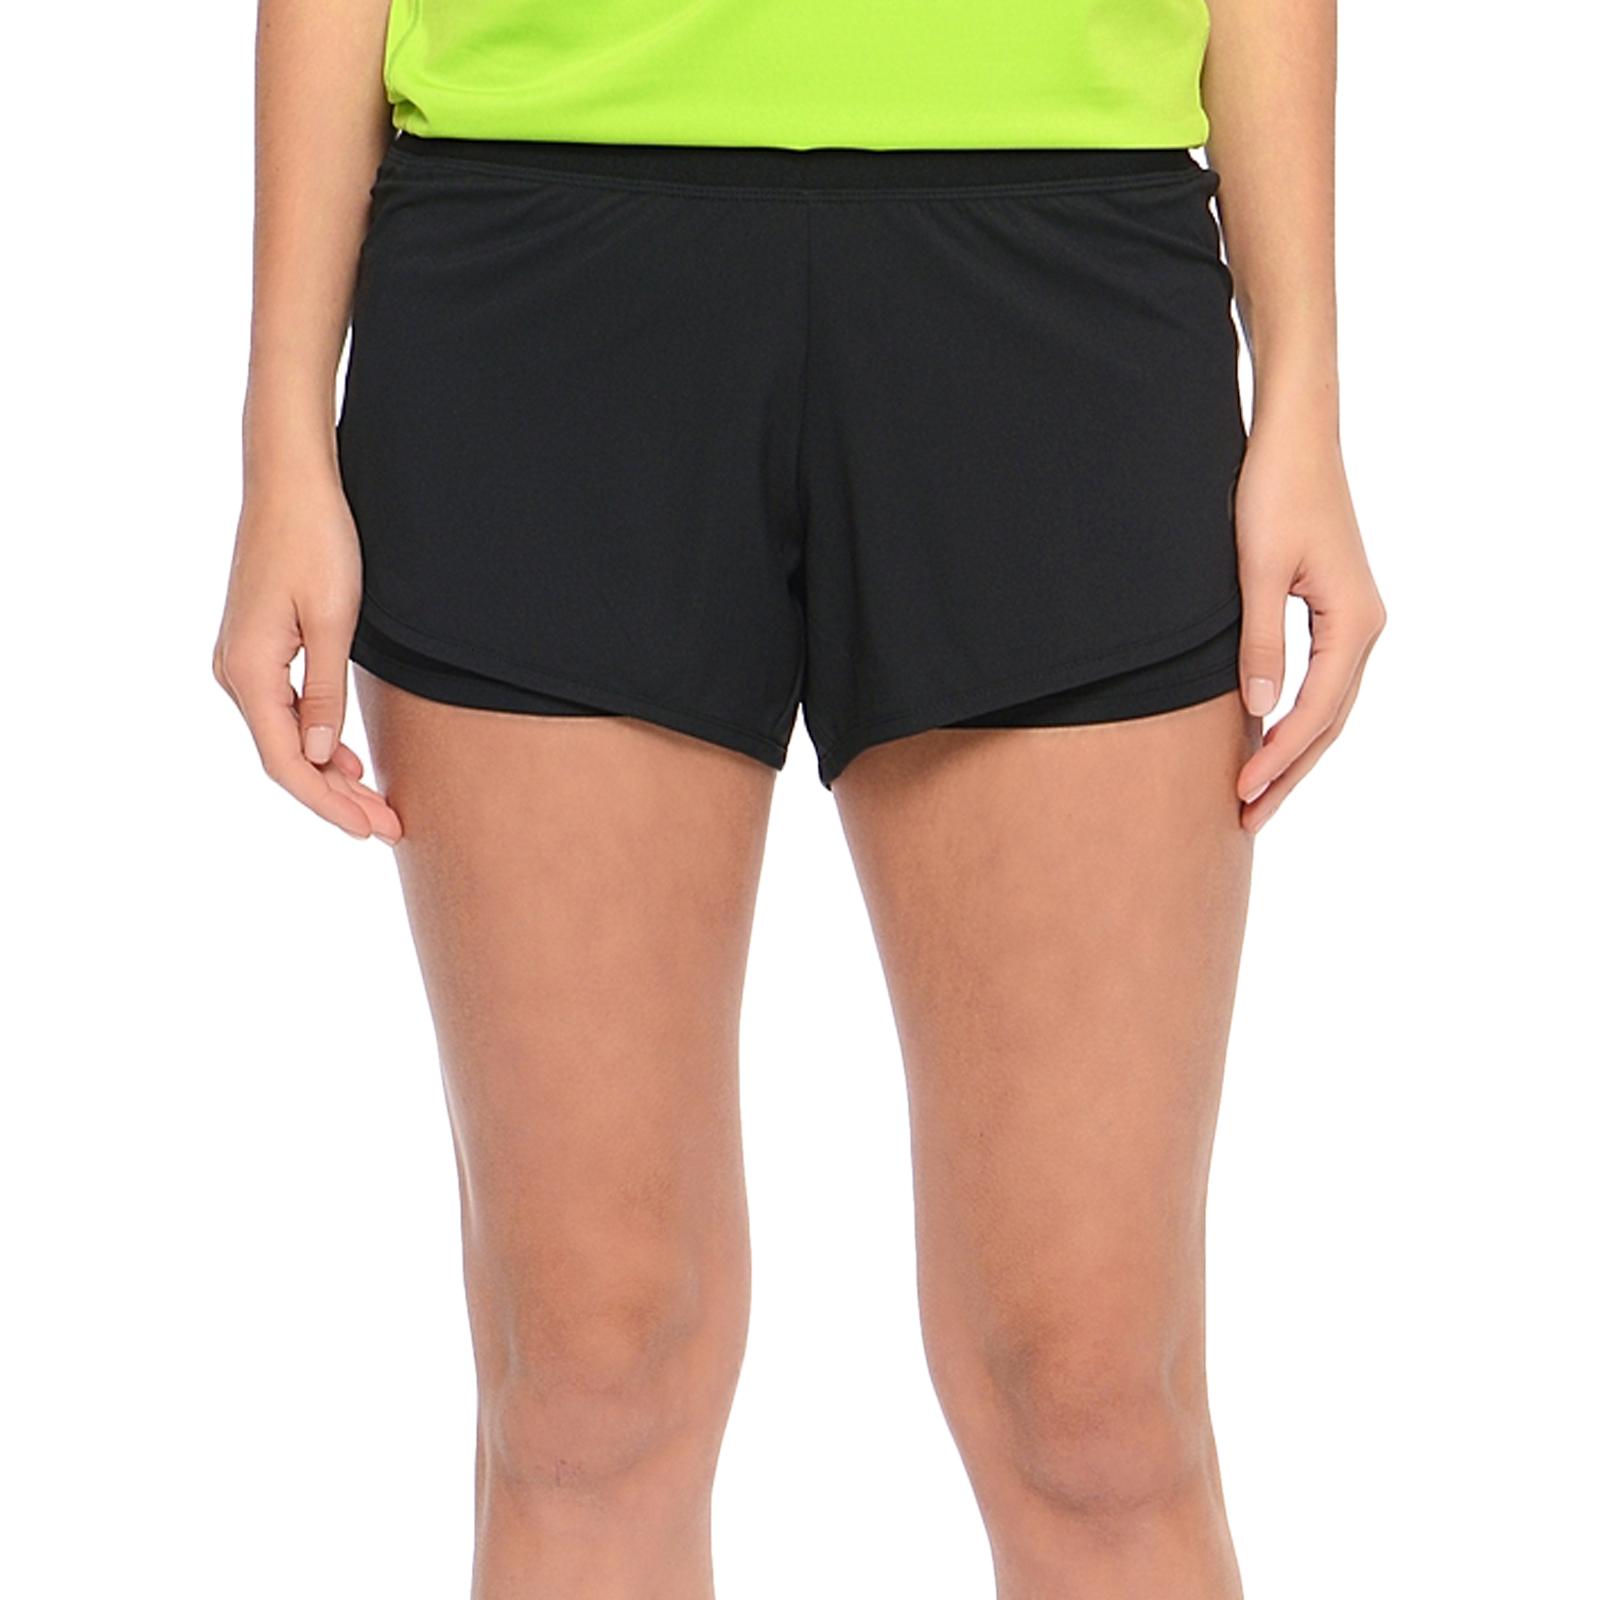 b2f49320ef52 Details about asics Performance Womens 2-n-1 3.5 Inch Marathon Running Gym  Shorts - L